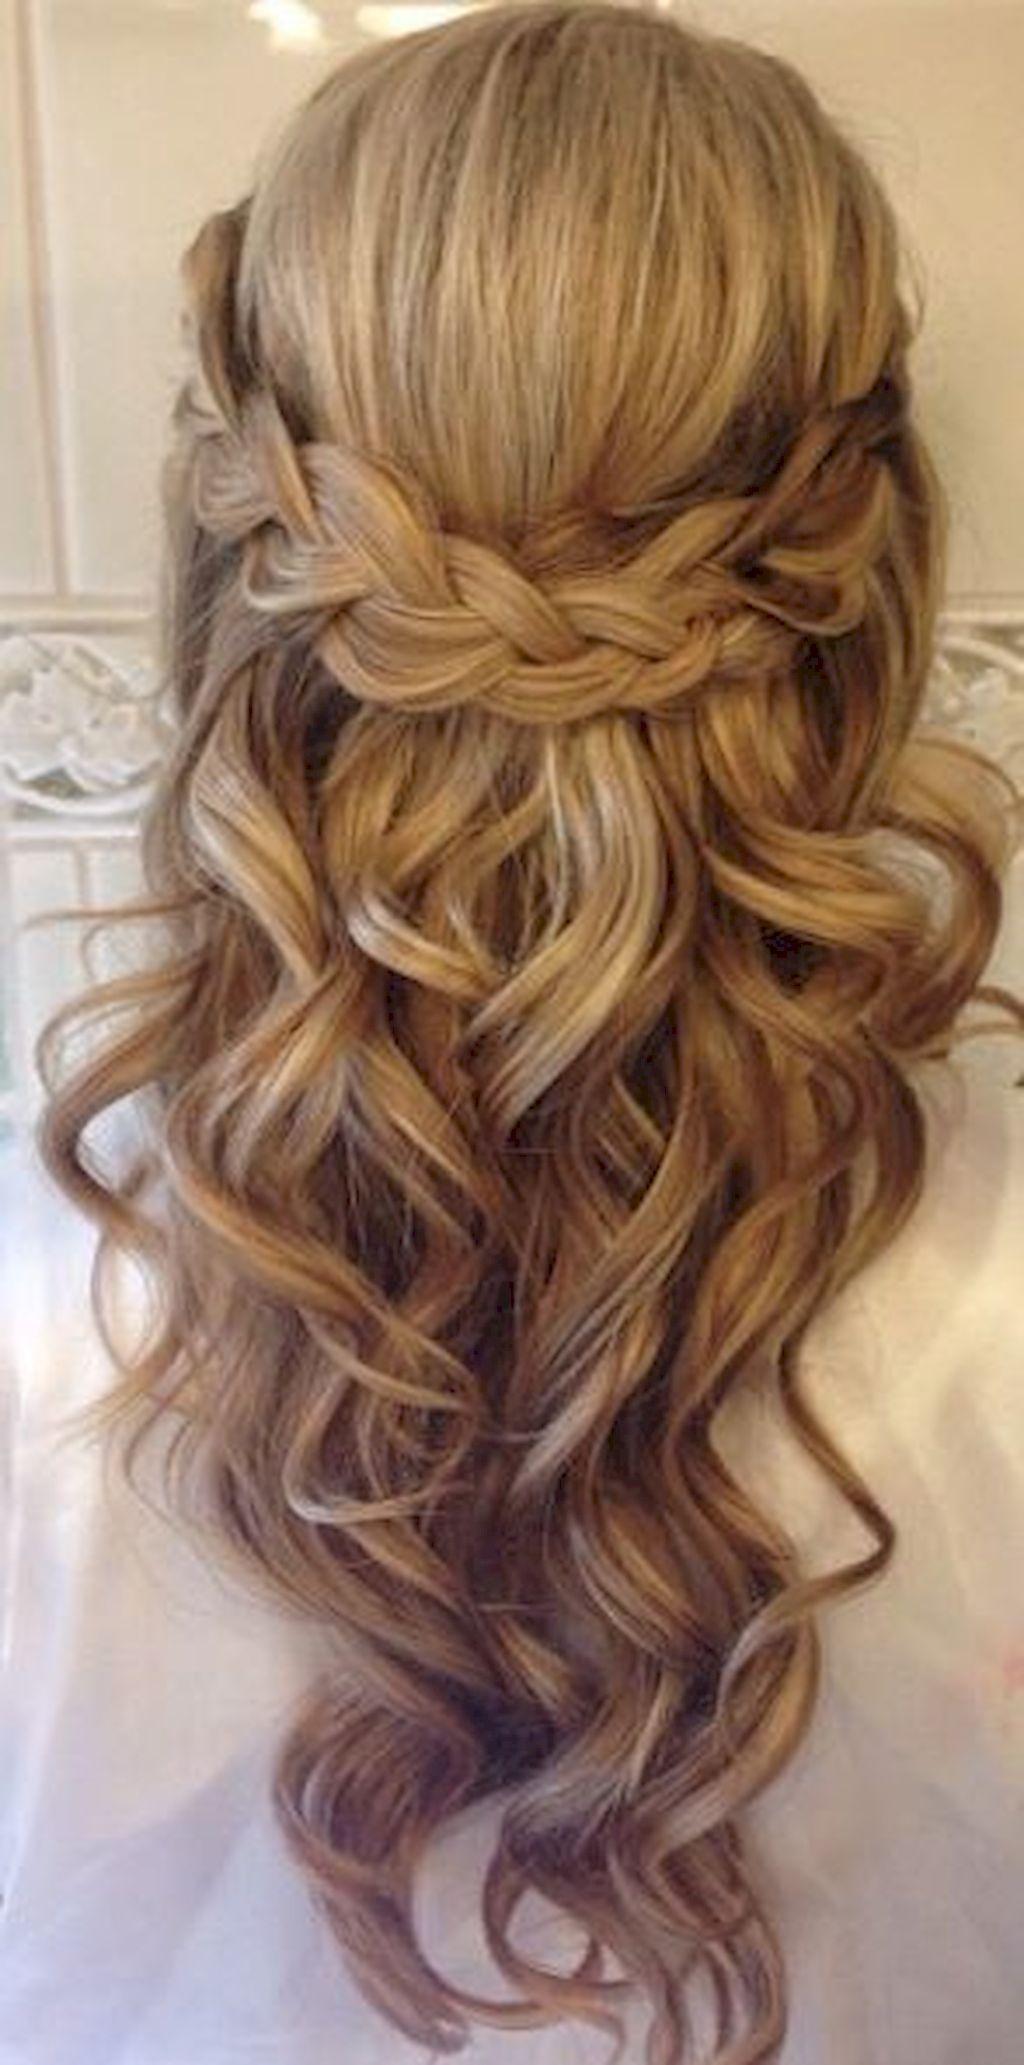 pin by emily epstein on hair | peinados de fiesta, estilos